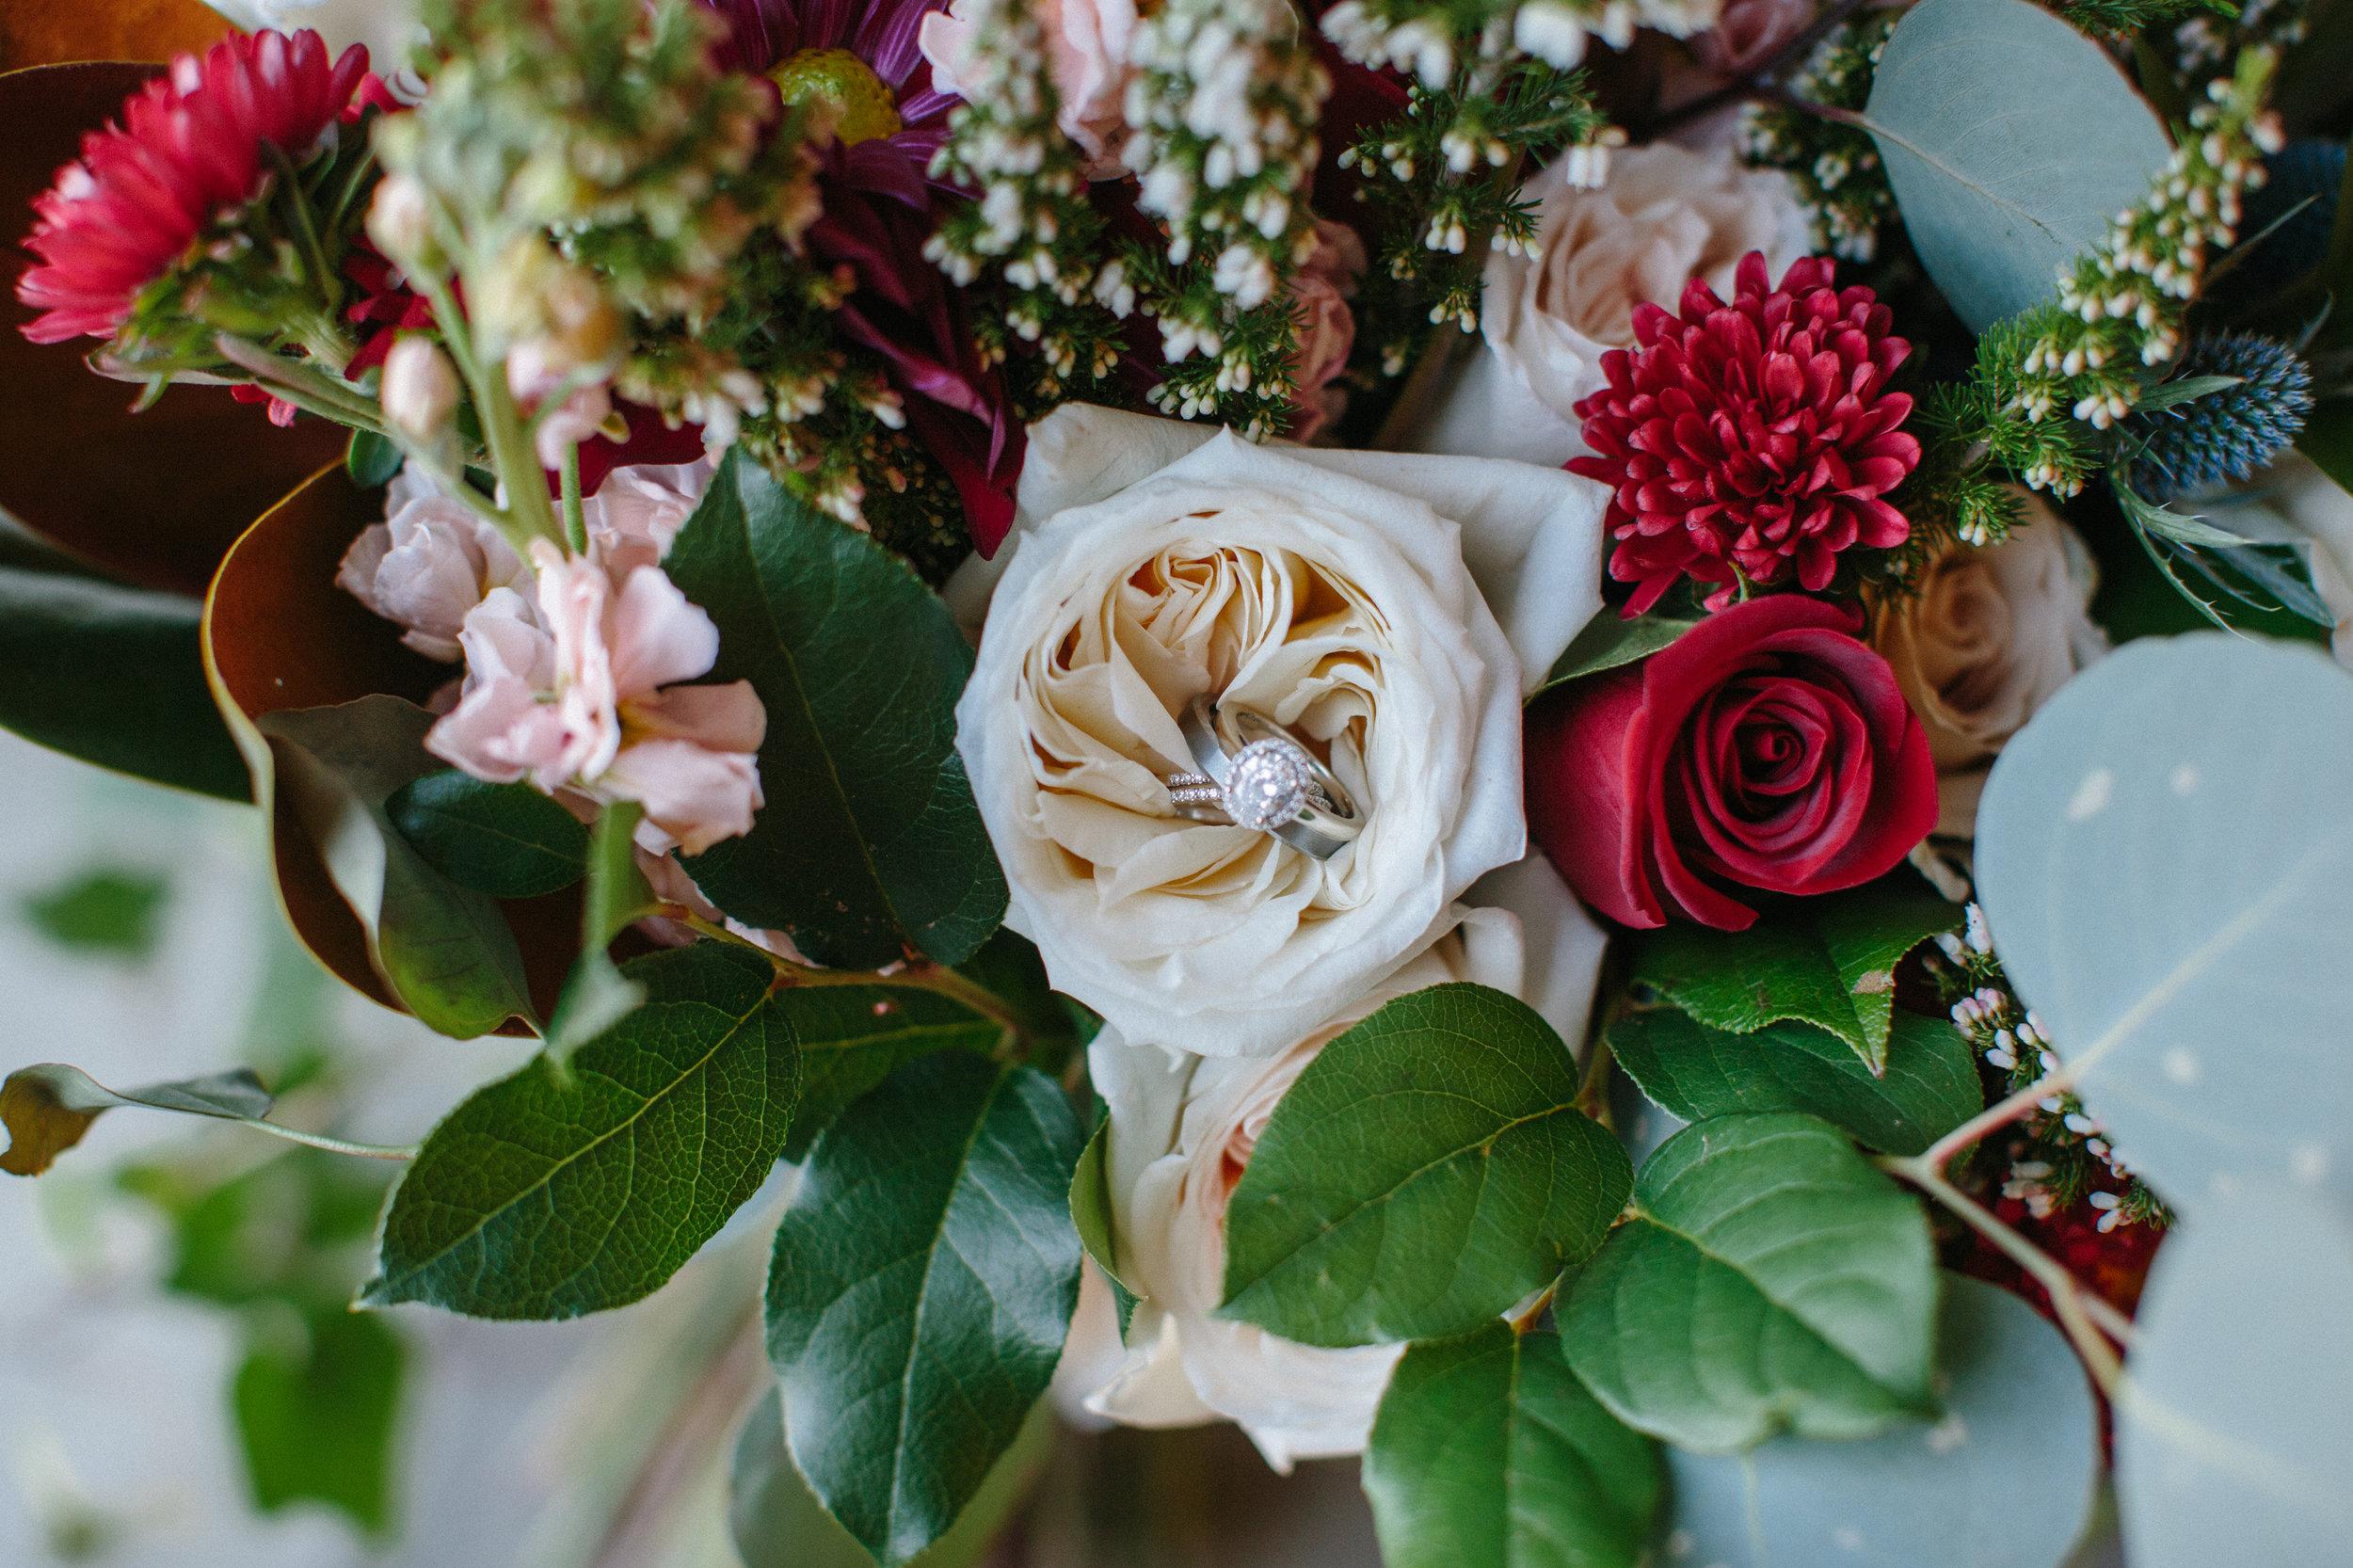 Lauren_Jeremy_Standard_Wedding_Knoxville_Abigail_Malone_Photography_FIlm-35.jpg